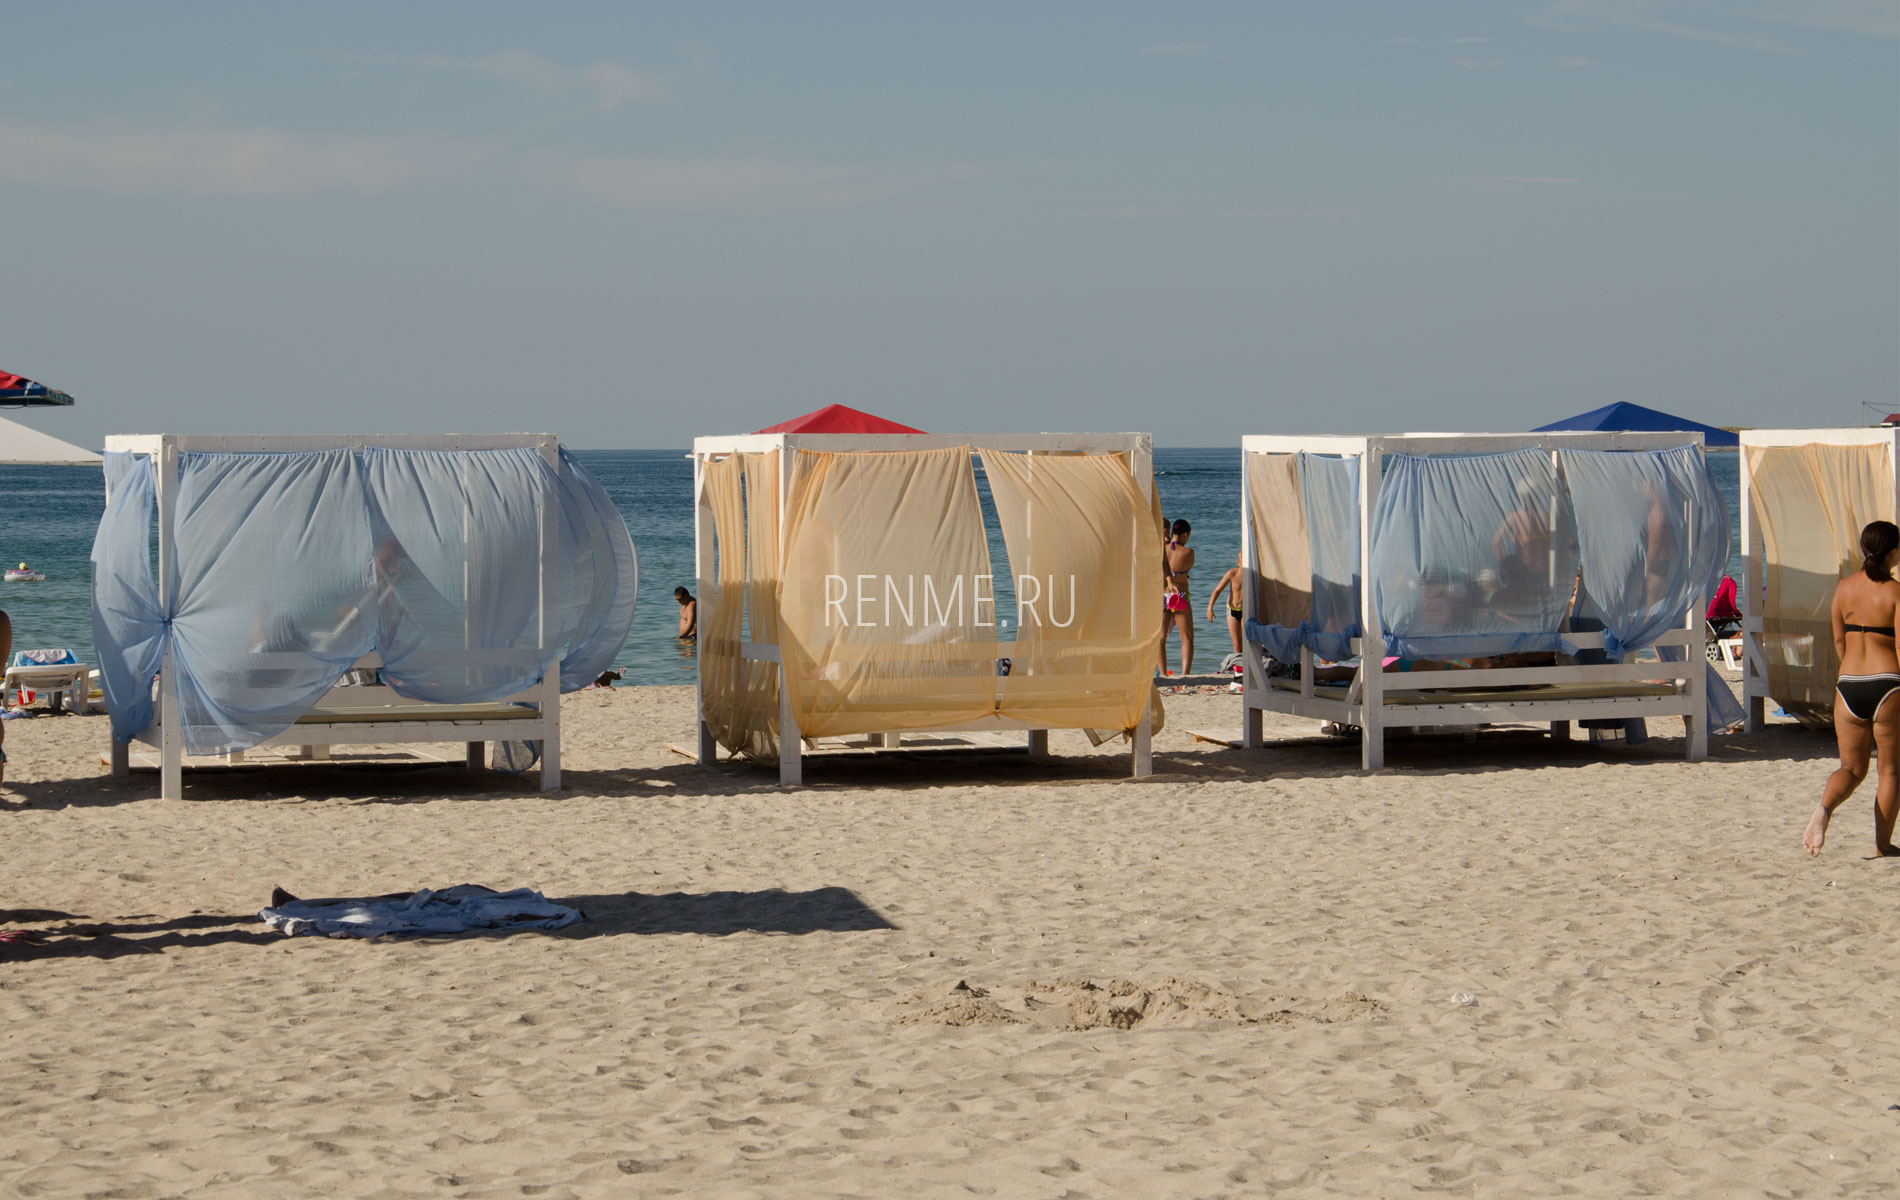 Бунгало на пляже в Черноморском. Фото Черноморского